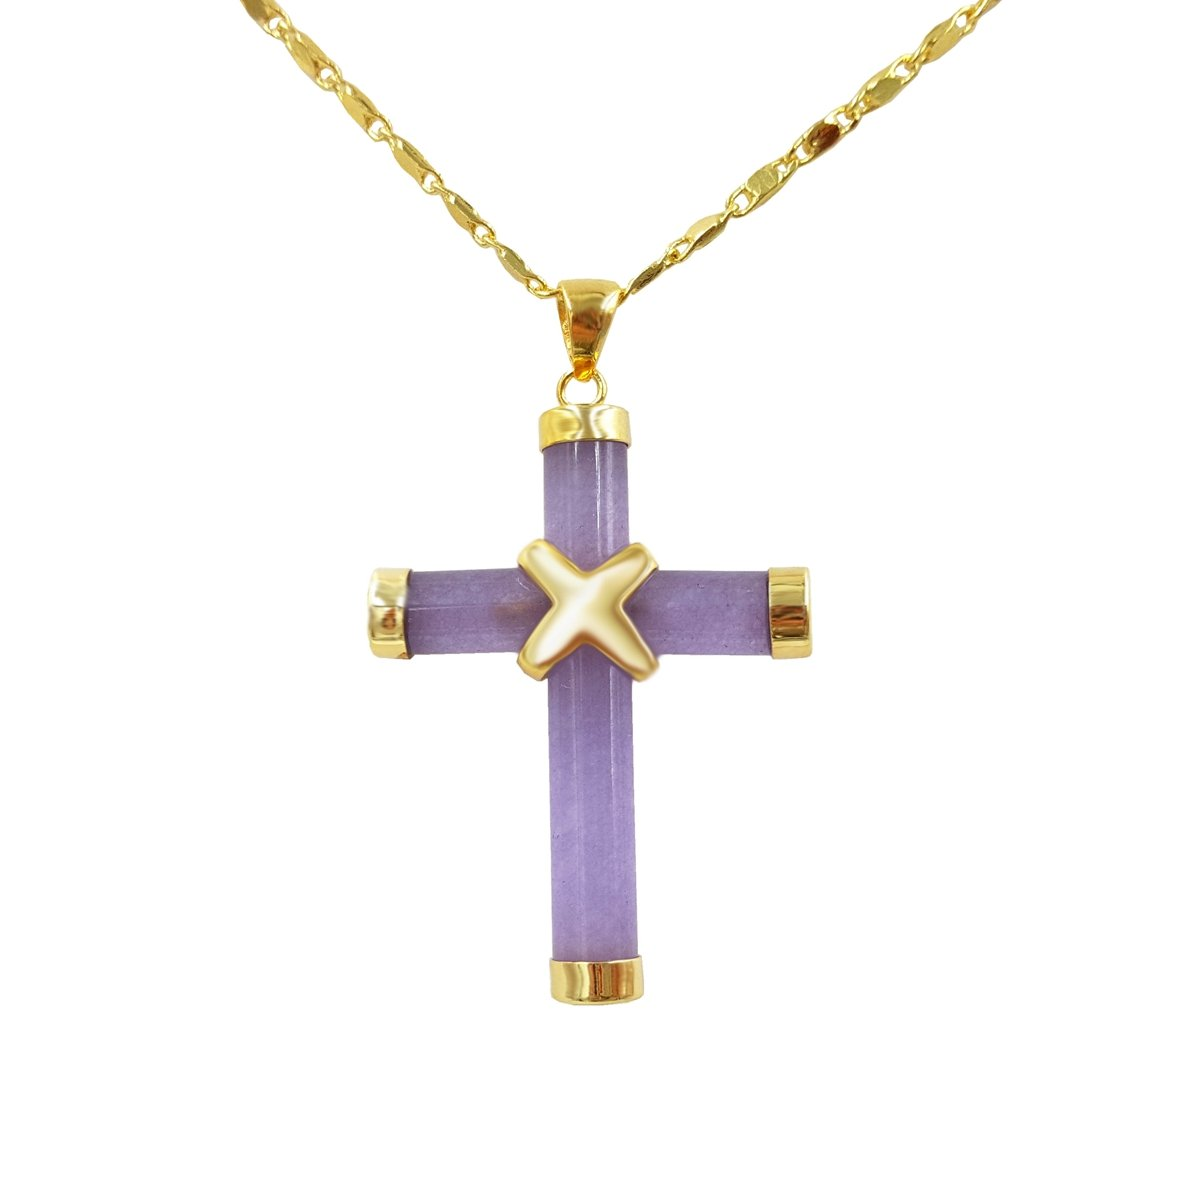 16'' Natural Stone Cross Pendant Necklace (Purple)